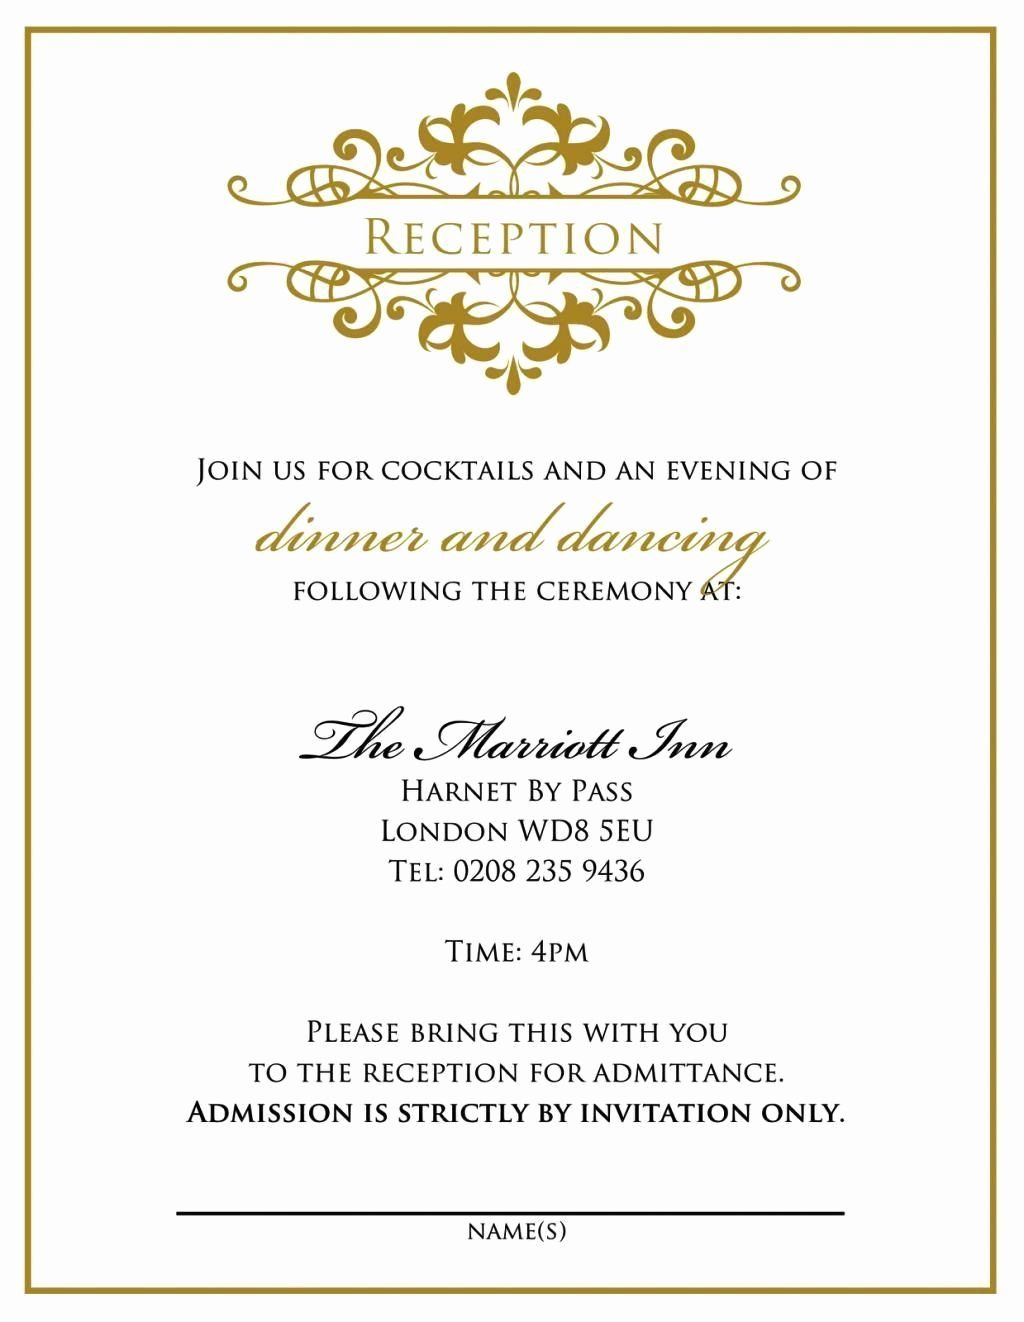 Ceremony Only Invitation Wording Elegant Wedding Invitation Wor In 2020 Wedding Reception Invitation Wording Reception Invitation Wording Wedding Reception Invitations